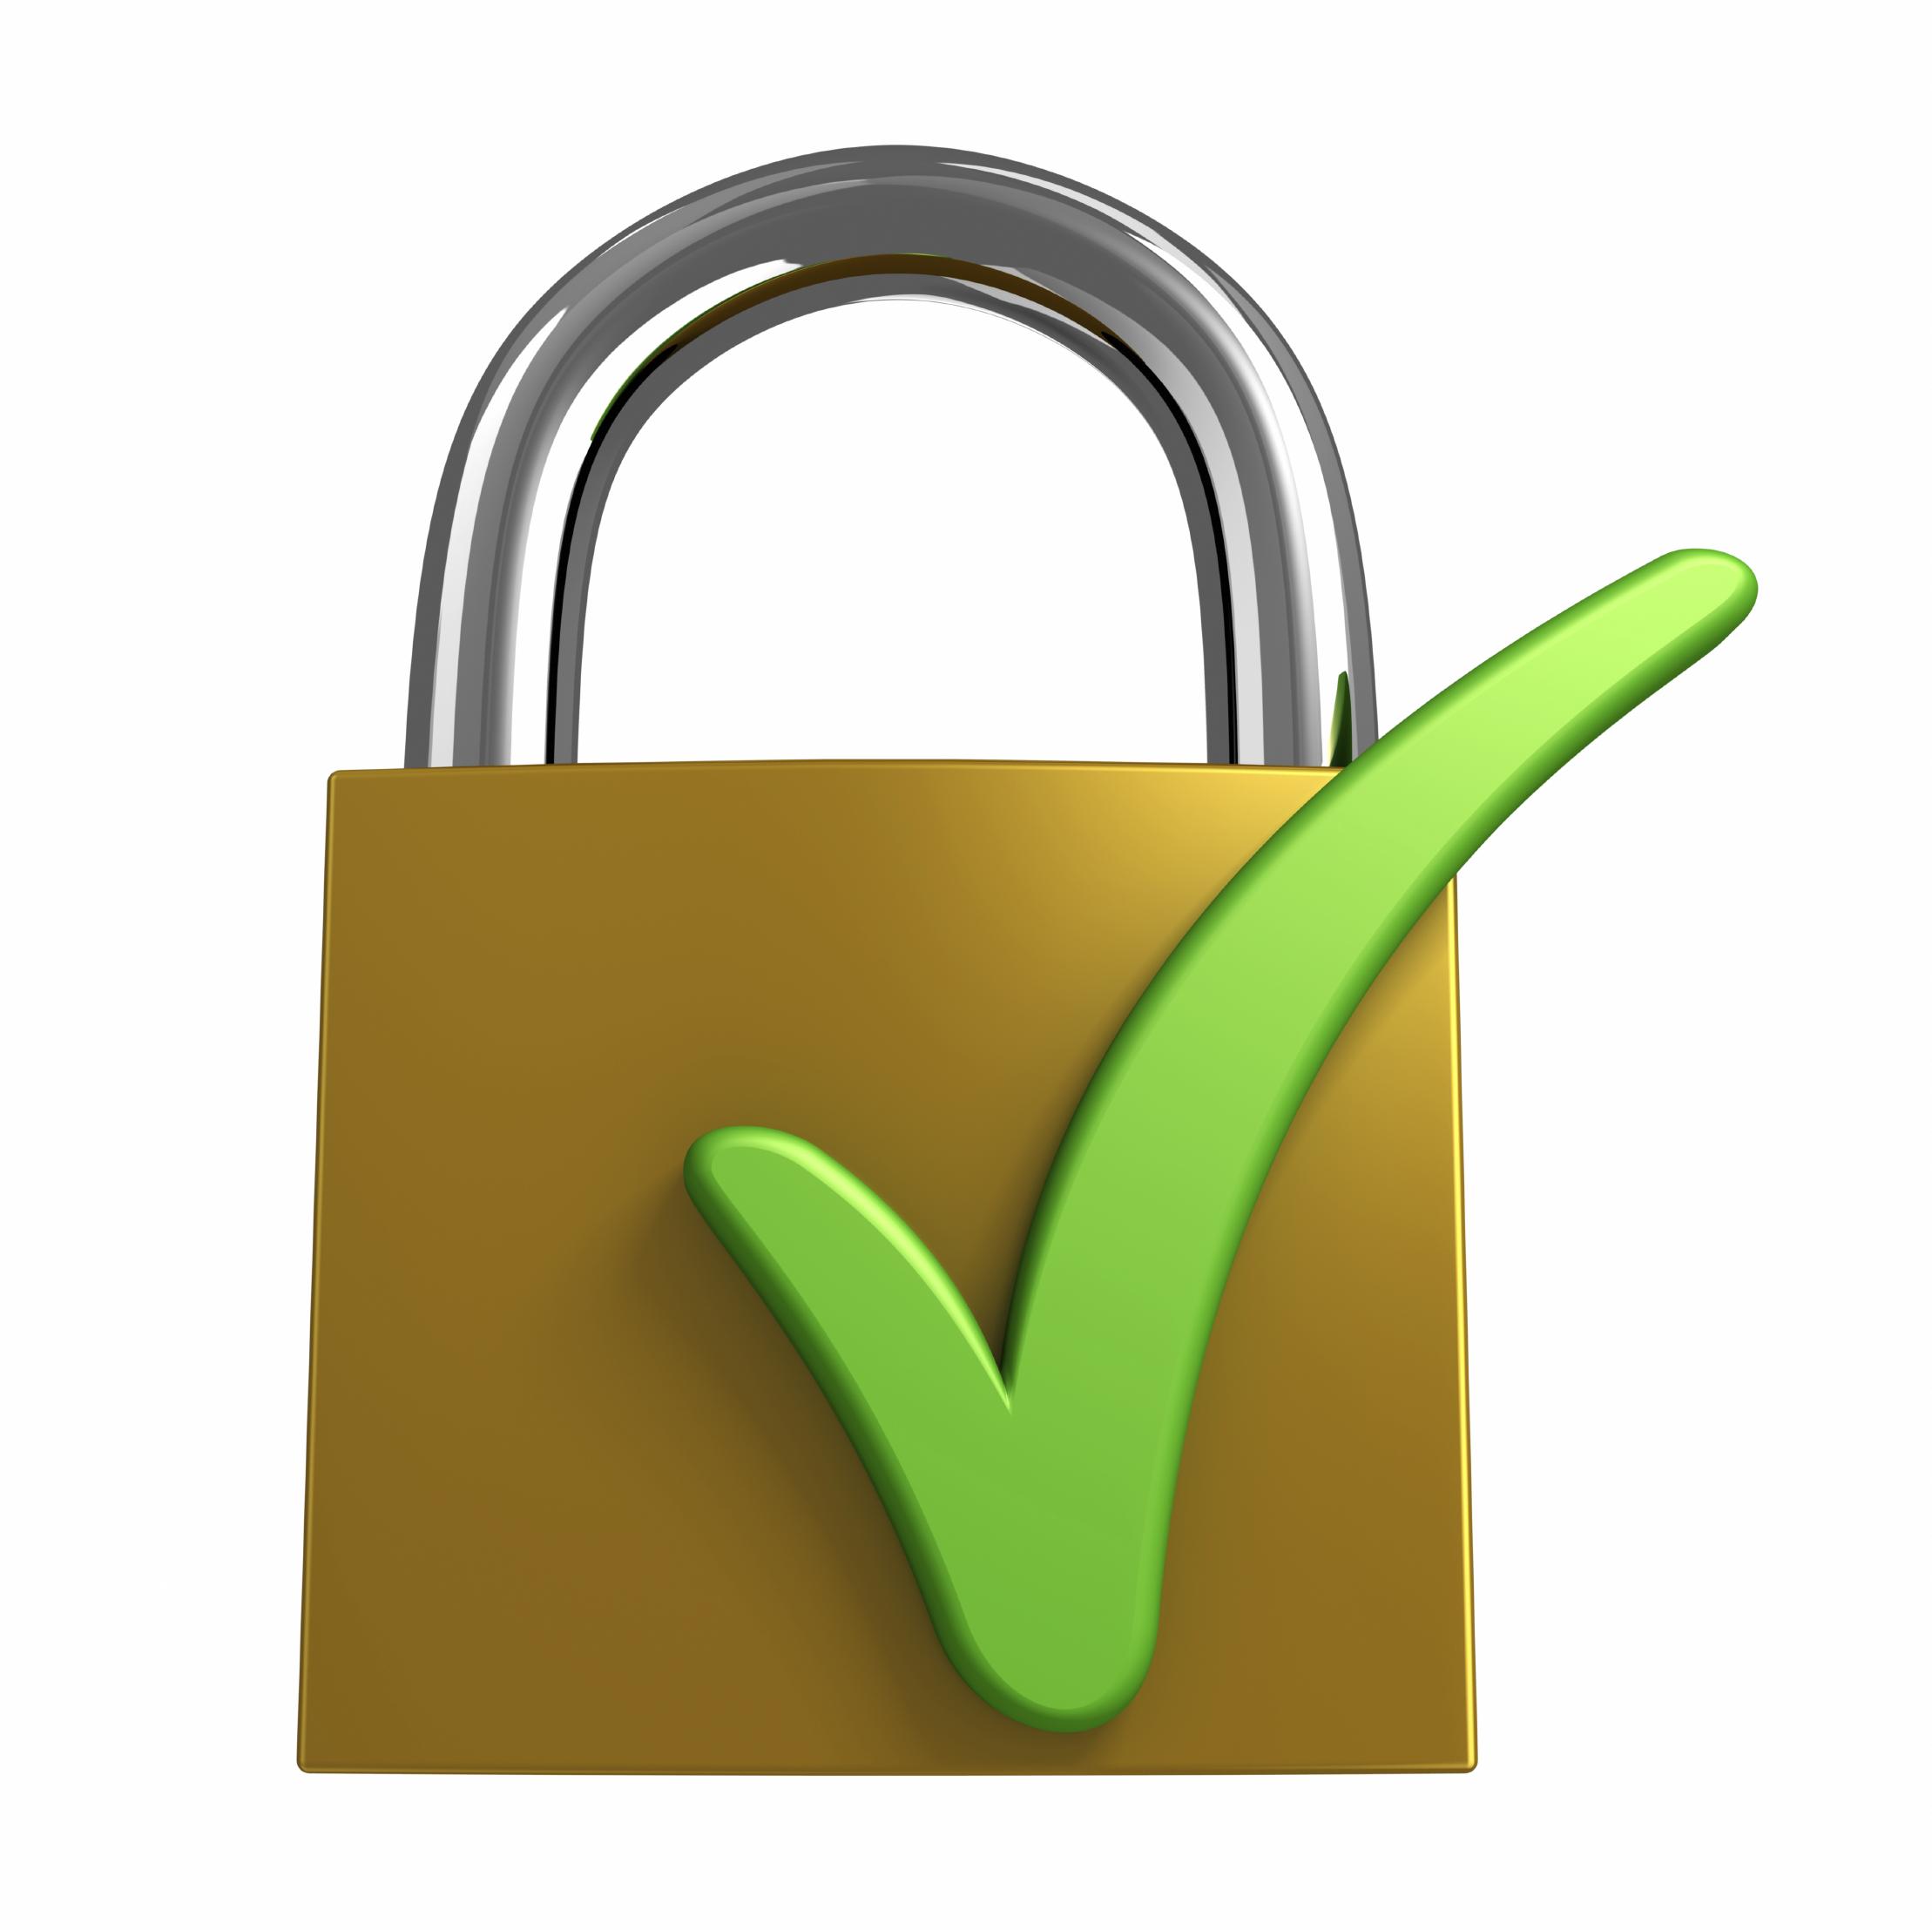 https://cdn2.hubspot.net/hub/138250/file-17674913-jpg/images/safe_lock.jpg